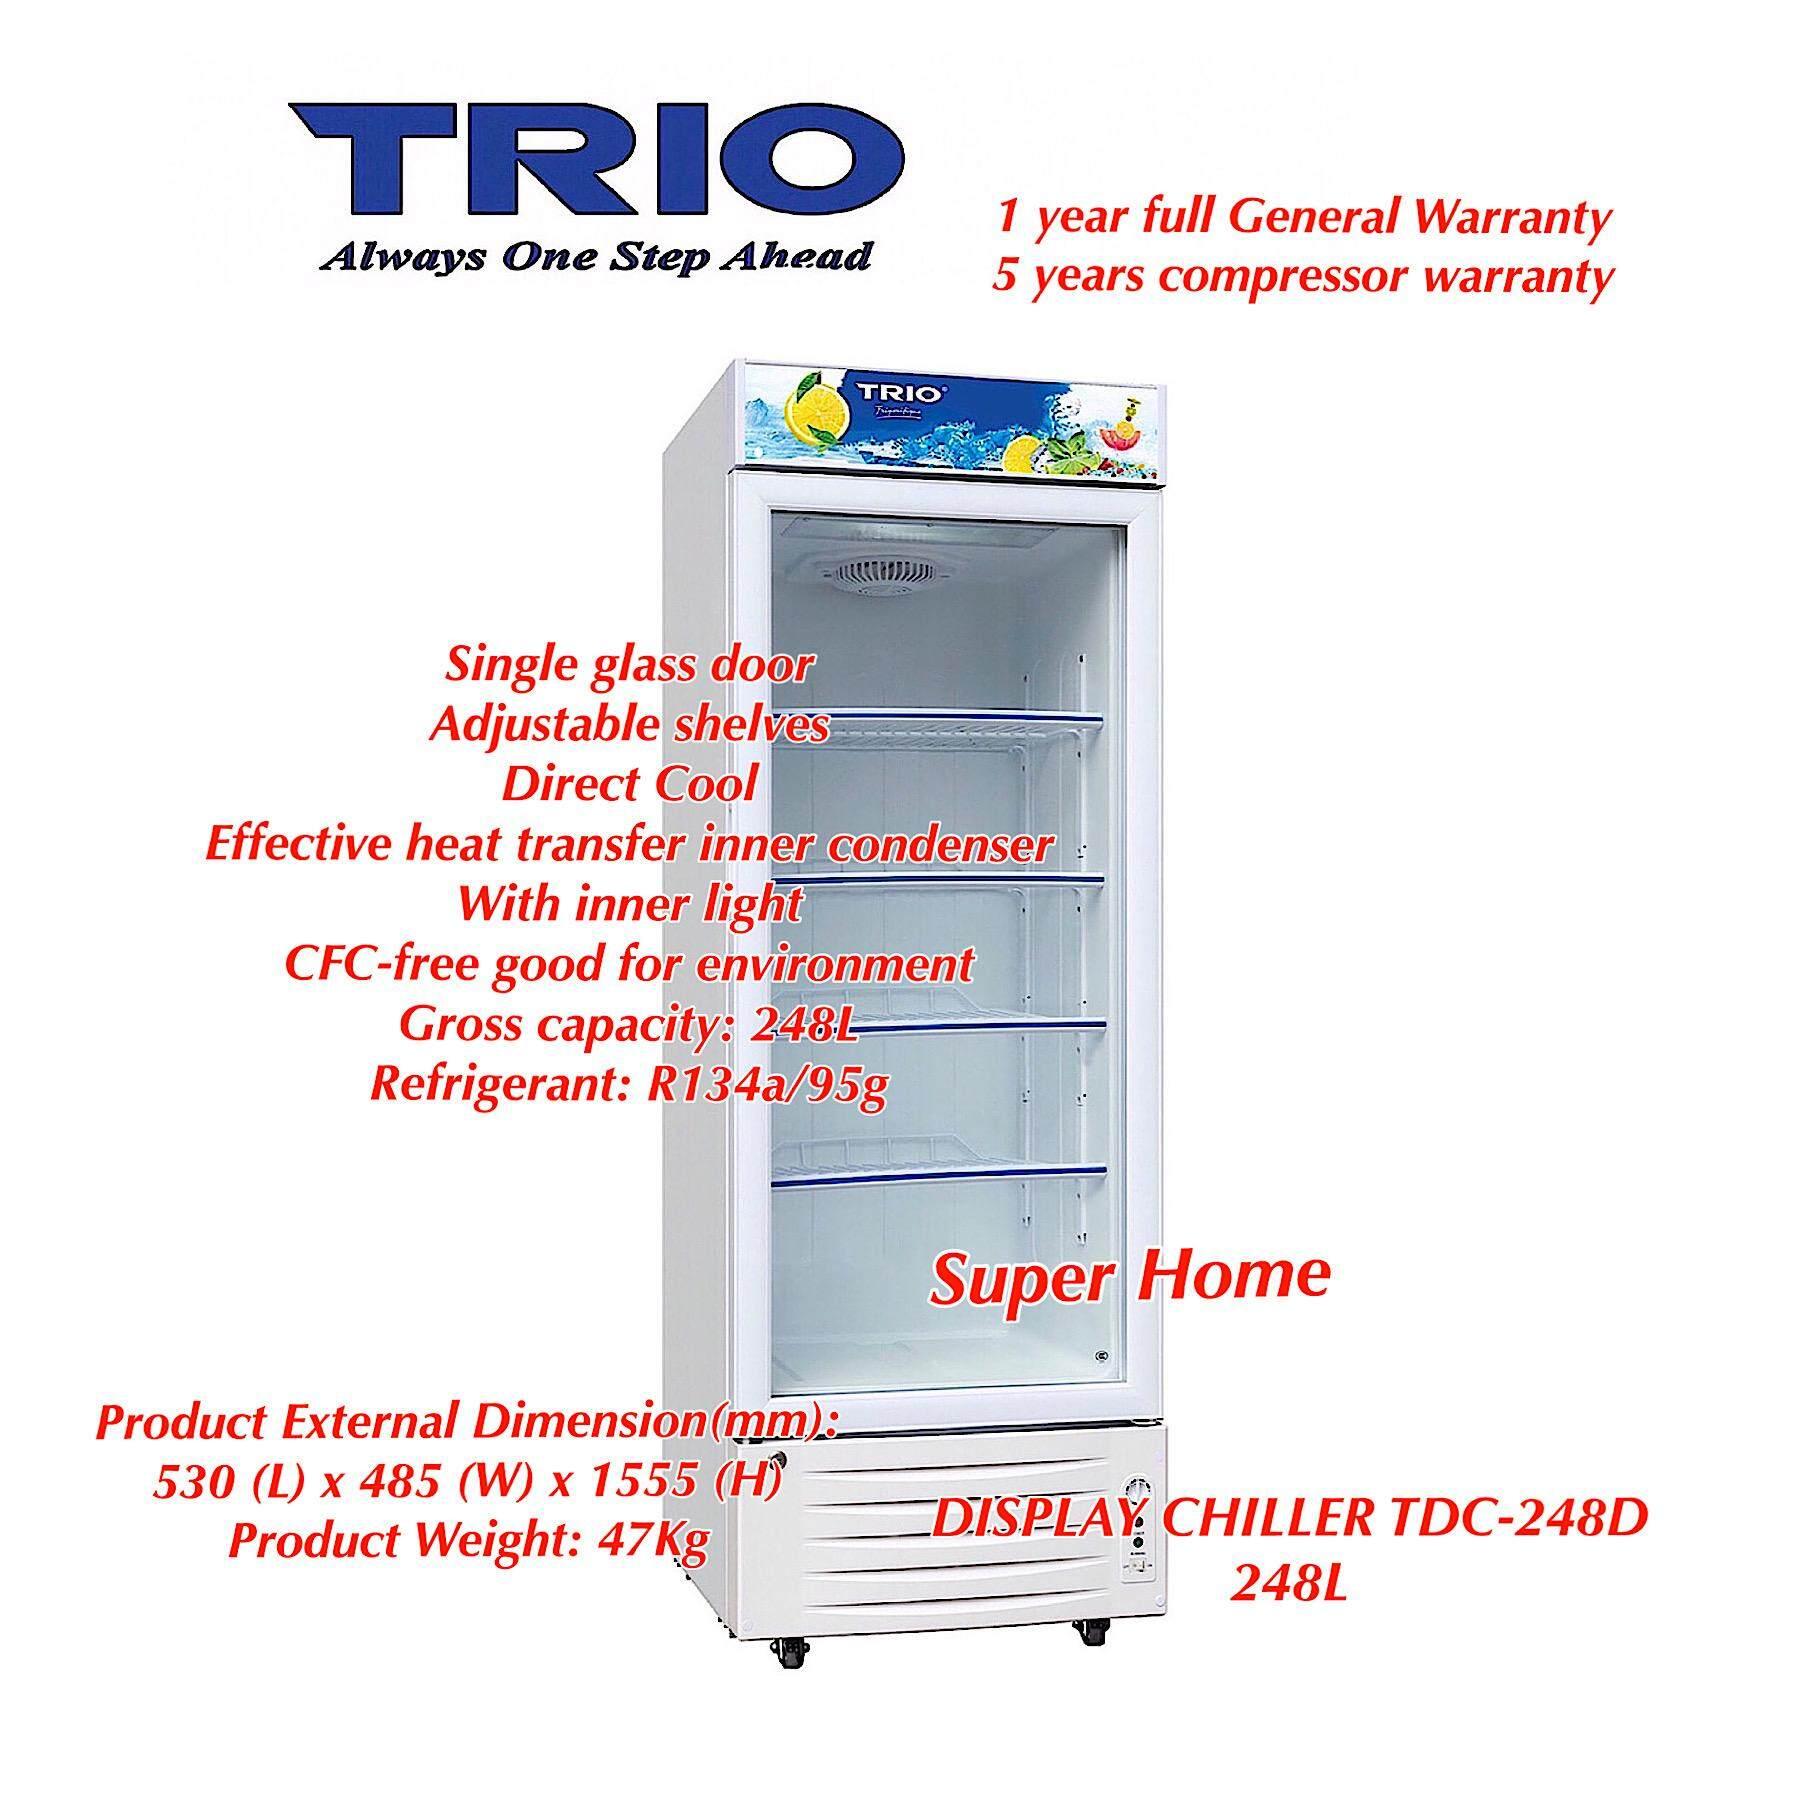 Trio Display Chiller TDC-248D - 248L